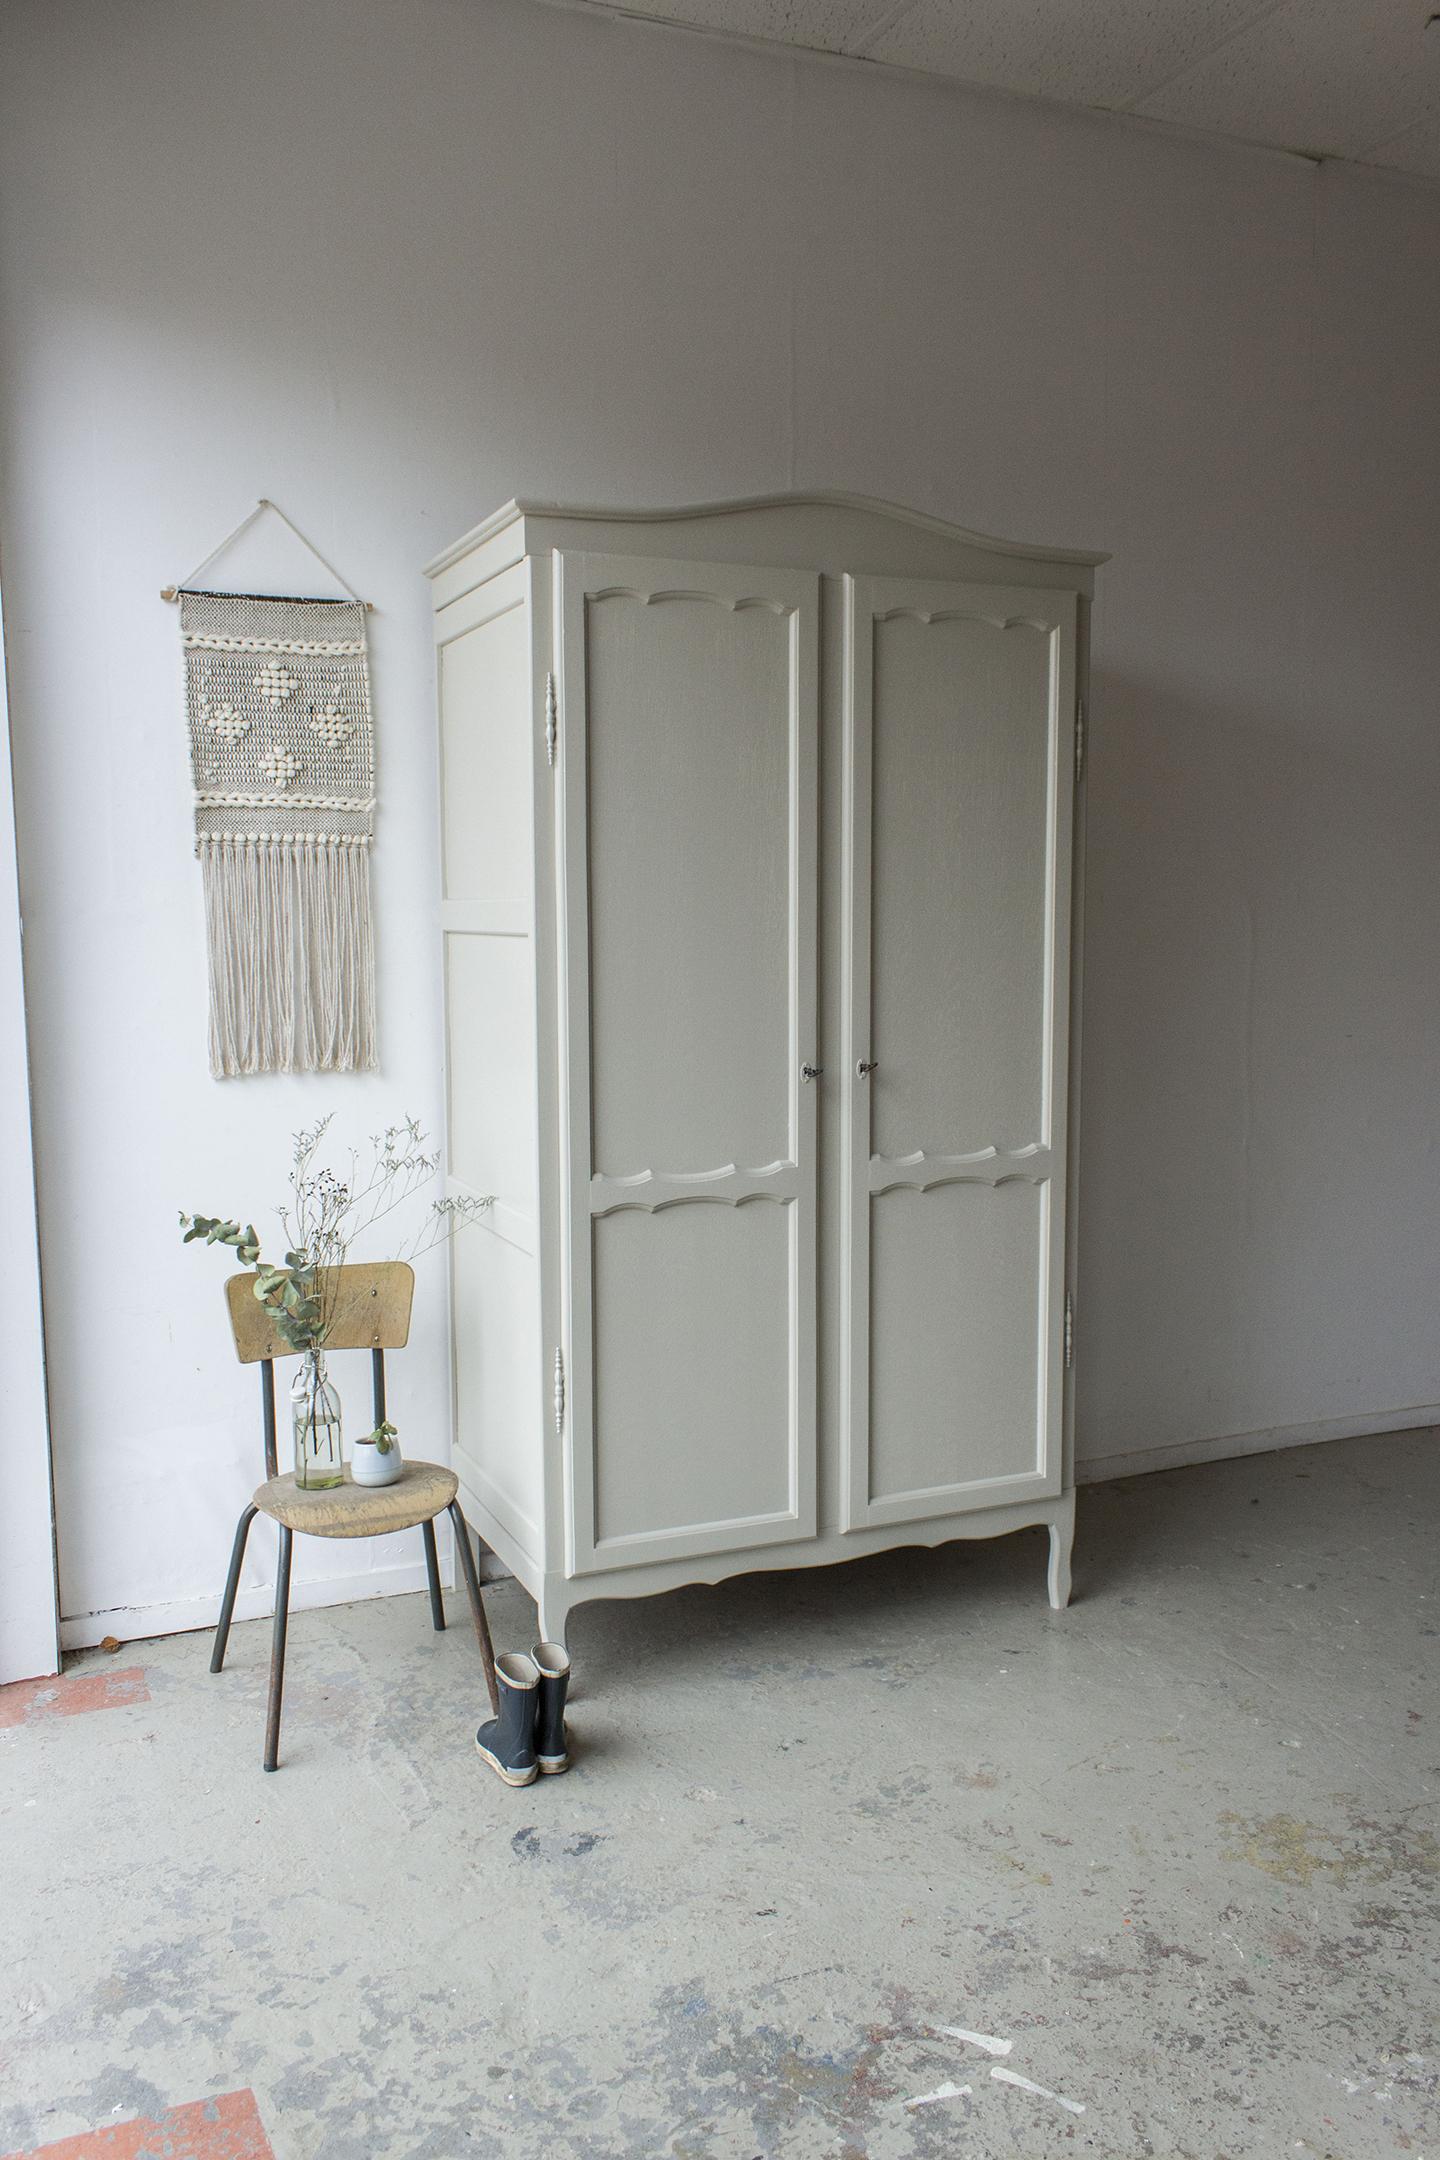 1406- demontabele sierlijke vintage kast in Linnen kleur - Firma zoethout_1.jpg